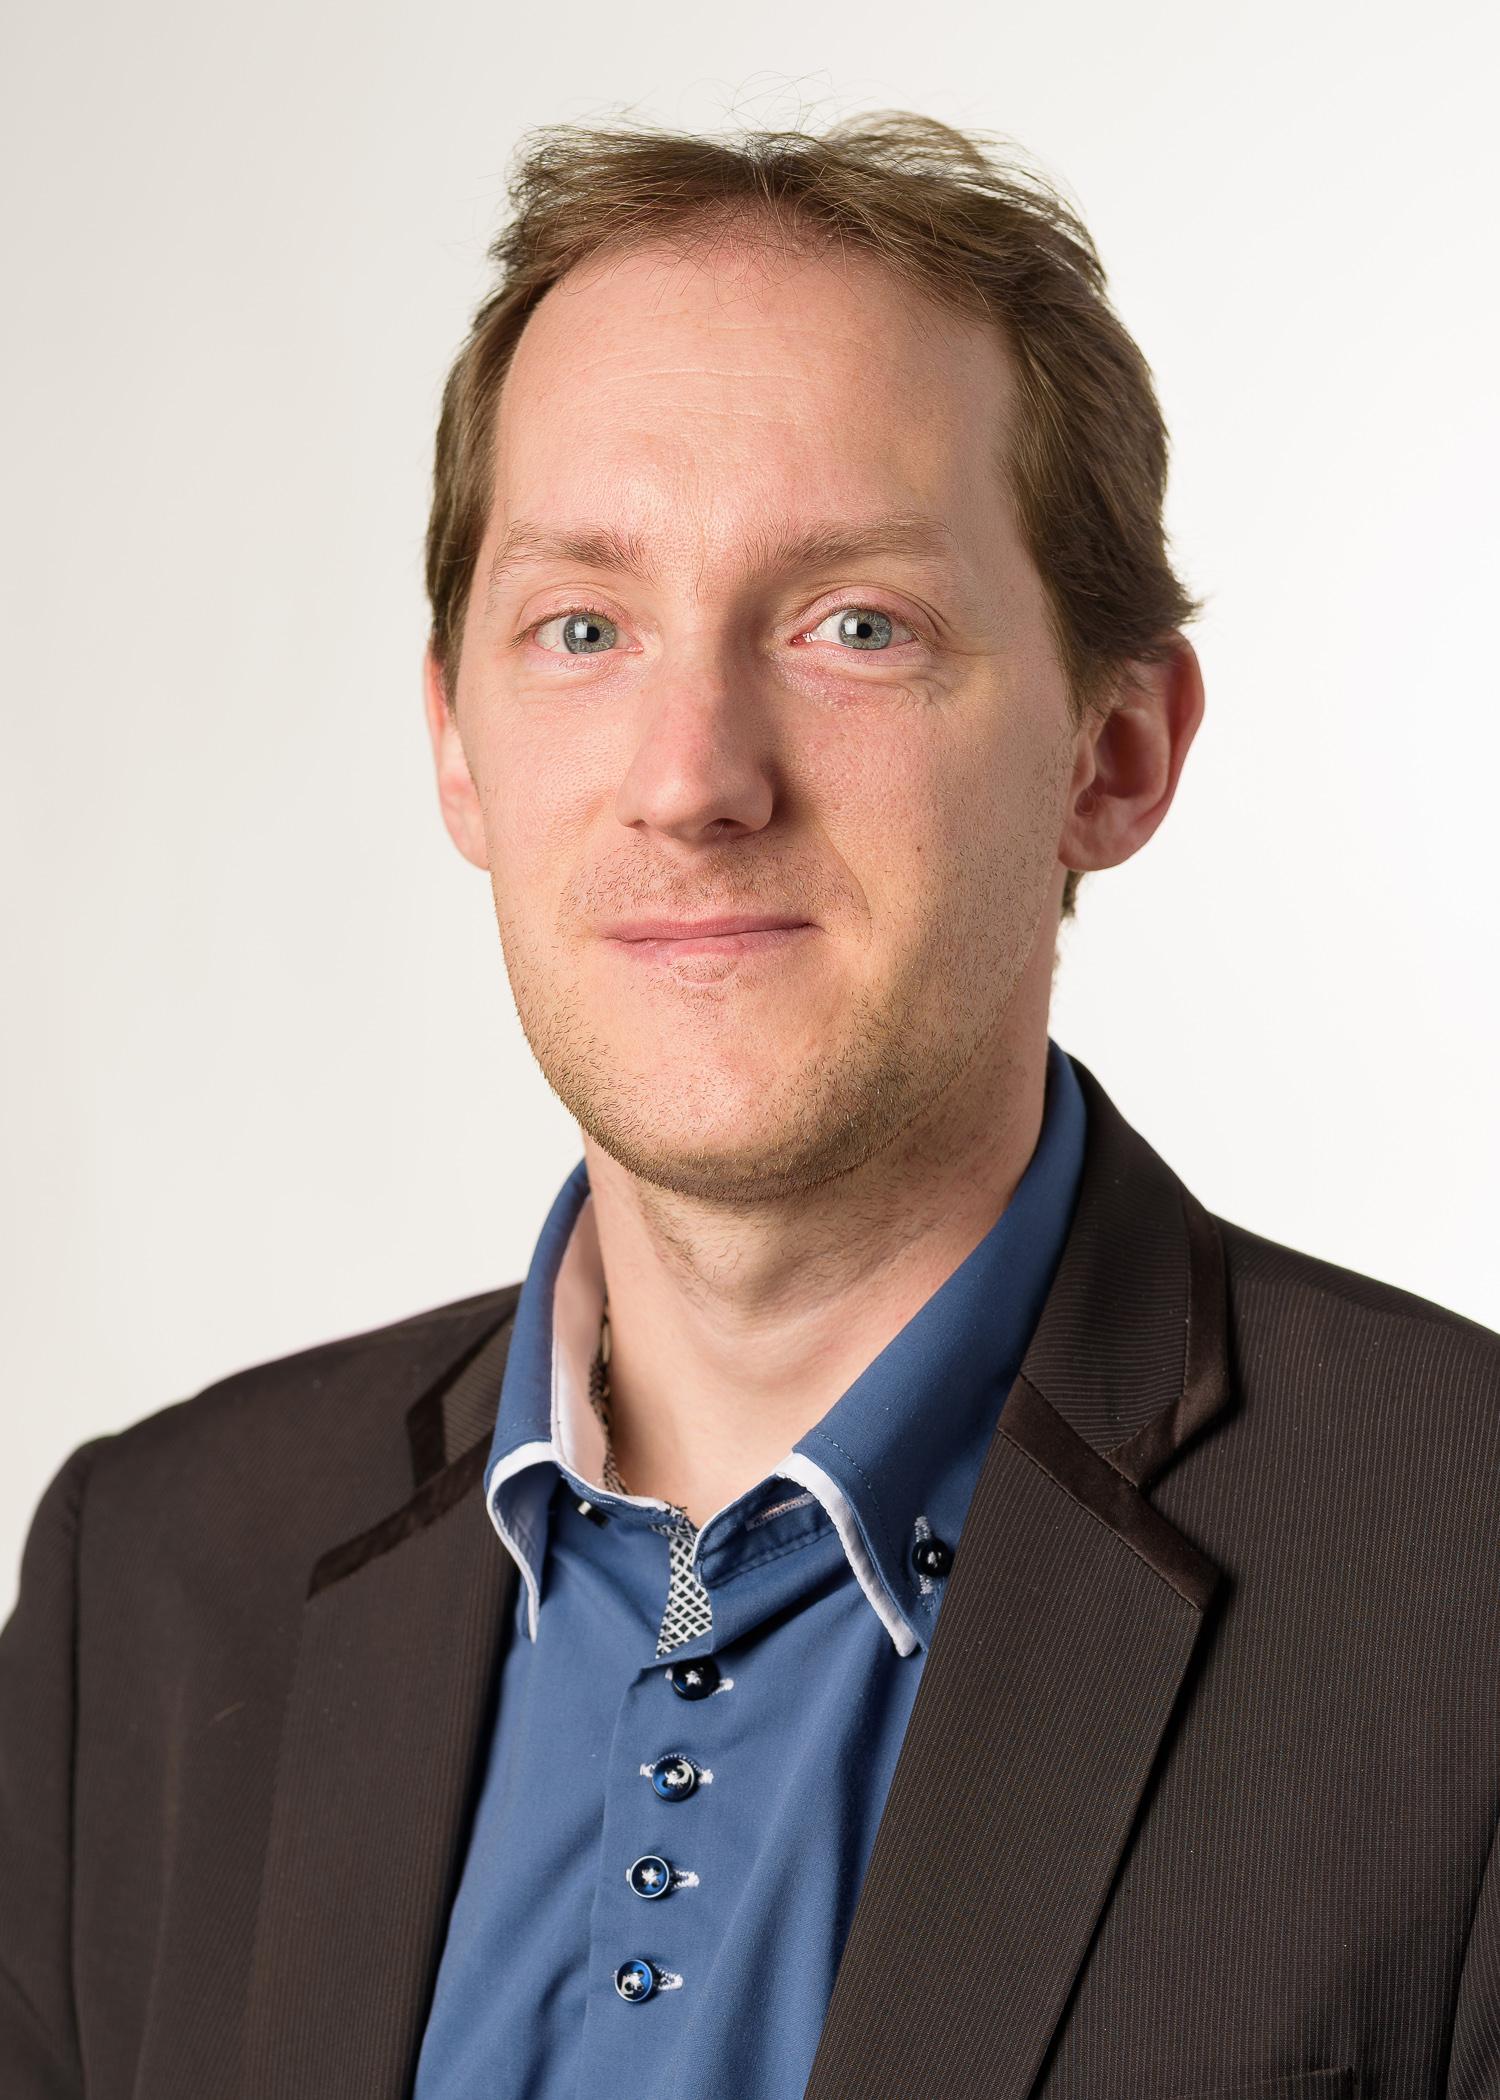 Guillaume Rousset